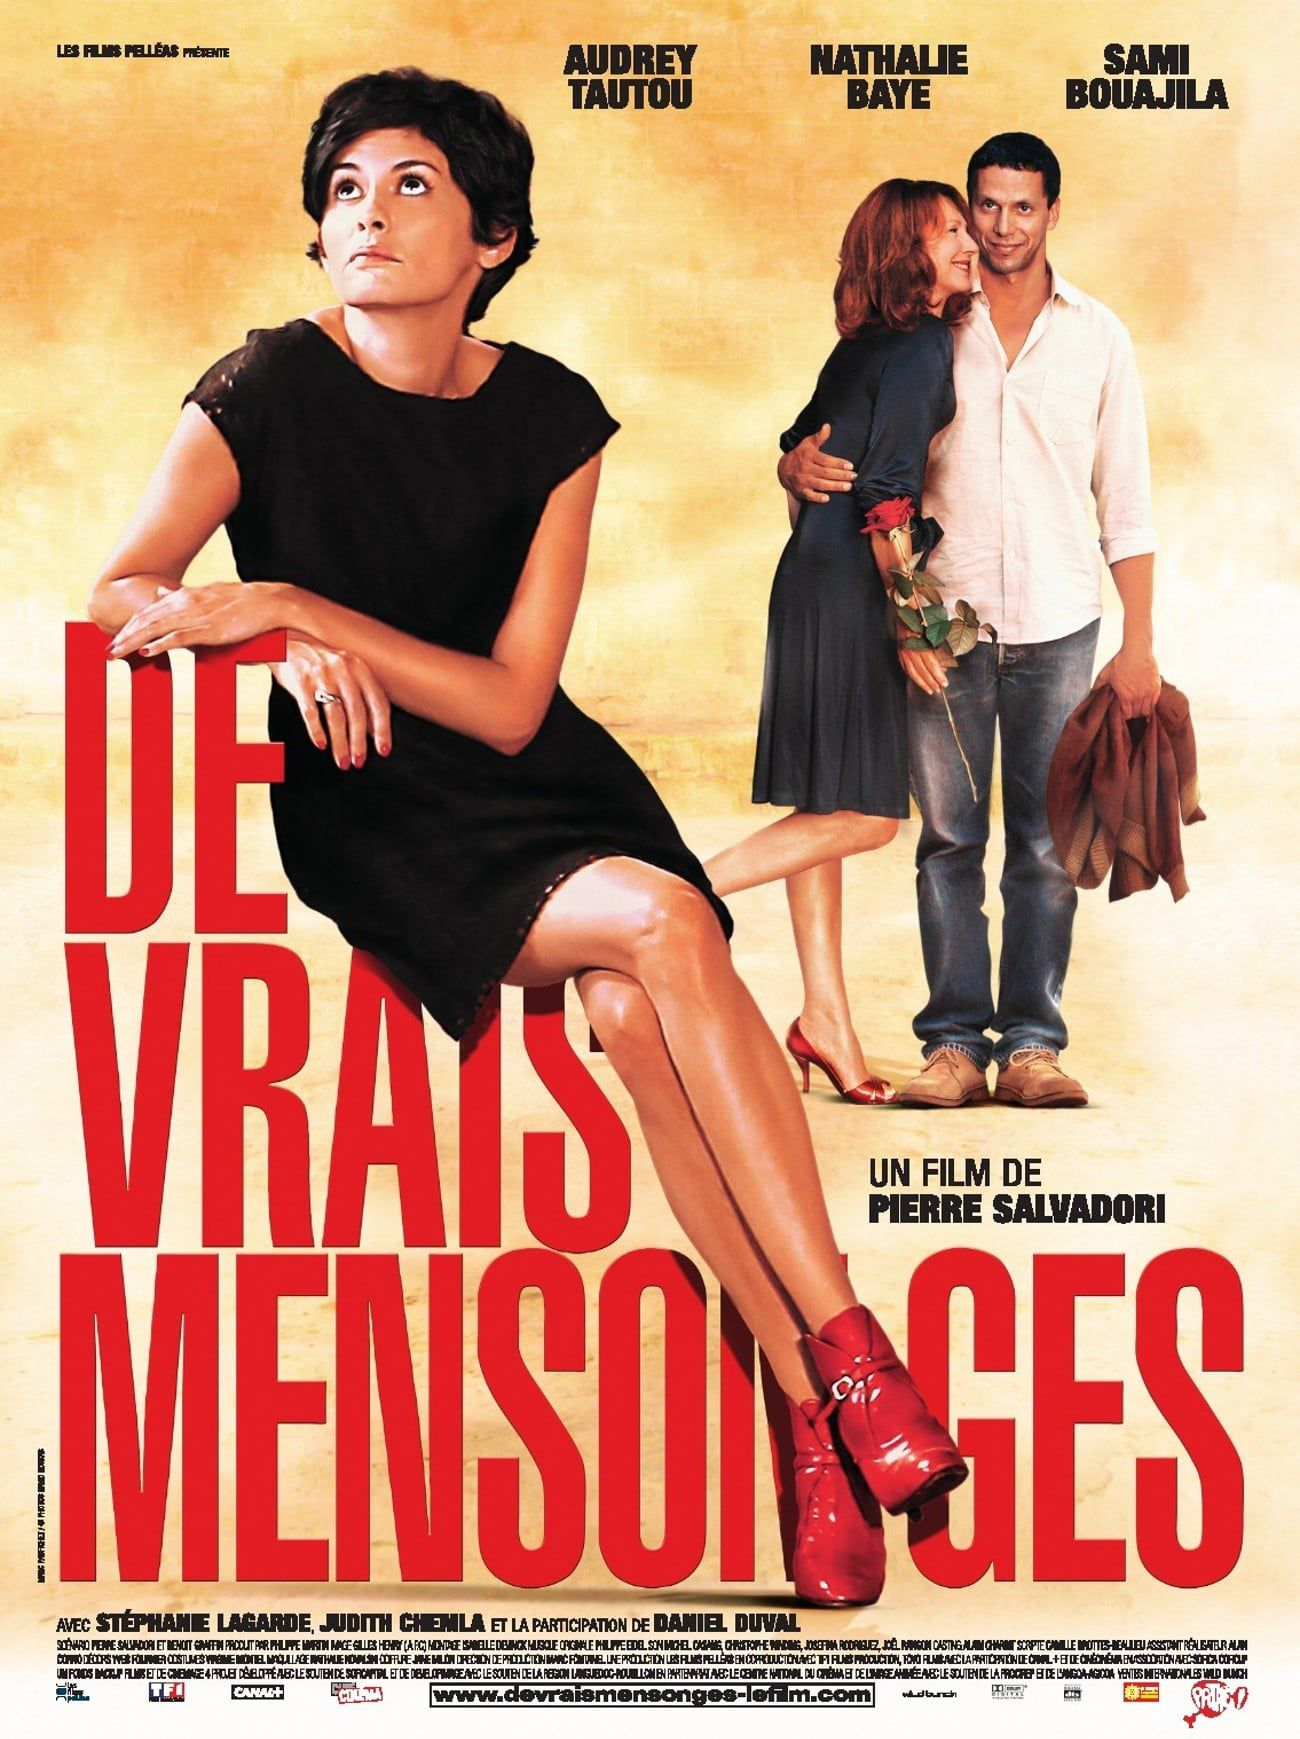 De vrais mensonges - Film (2010)